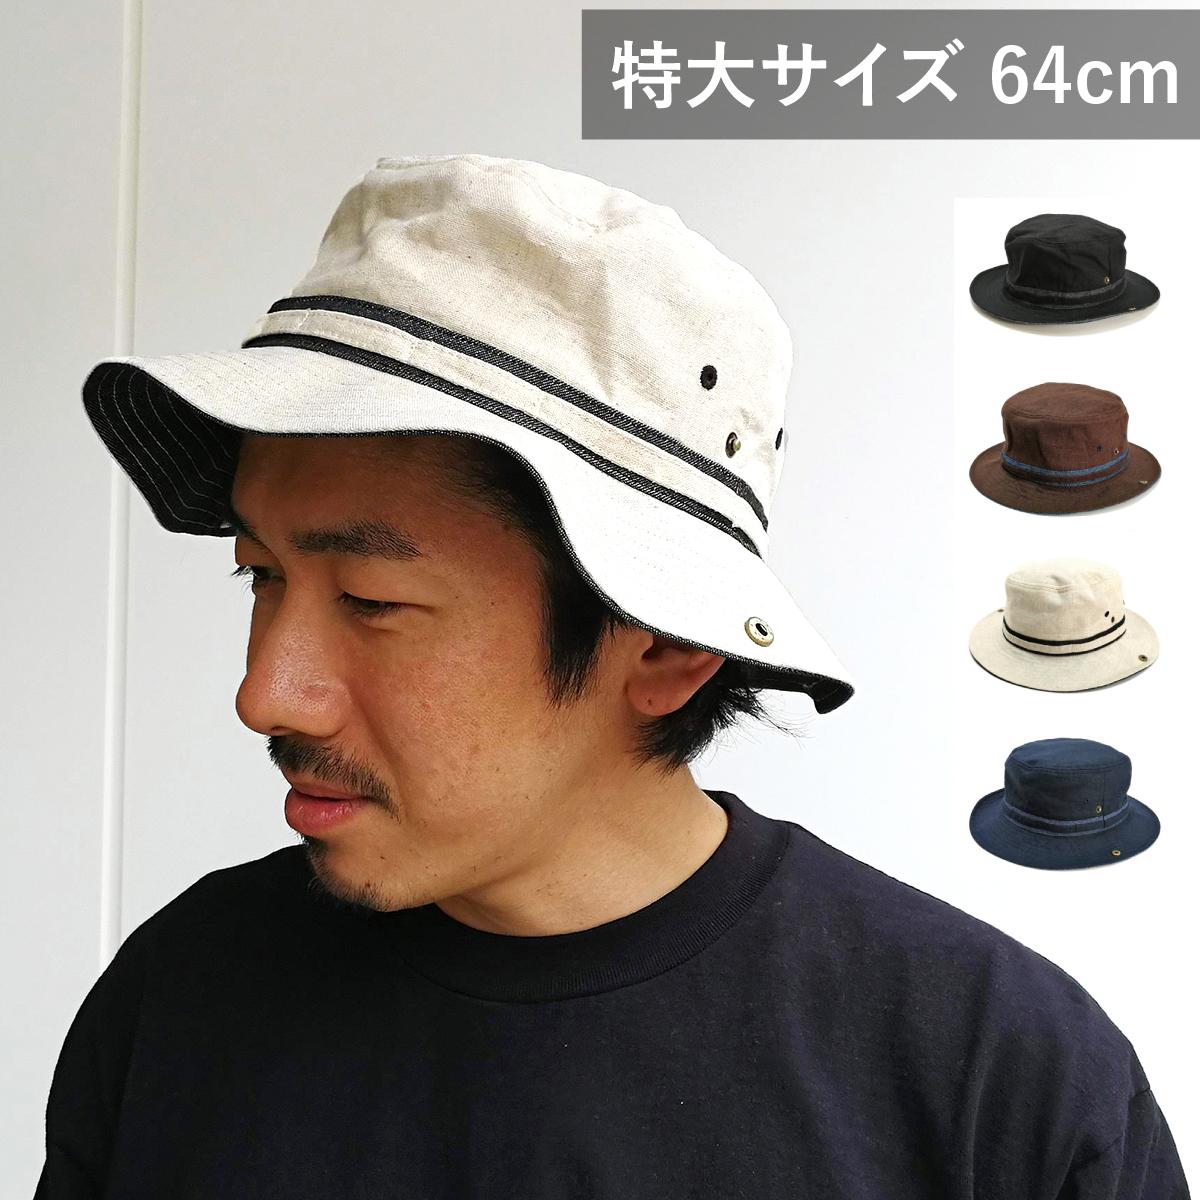 7b775ec58d6ee Hats and Caps River-Up: Extra large size 64 cm ☆ linen material Safari Hat-Linen  Denim Hat ( リネンデニム Hat ) [BASIQUENTI] men's, walking, walks, ...